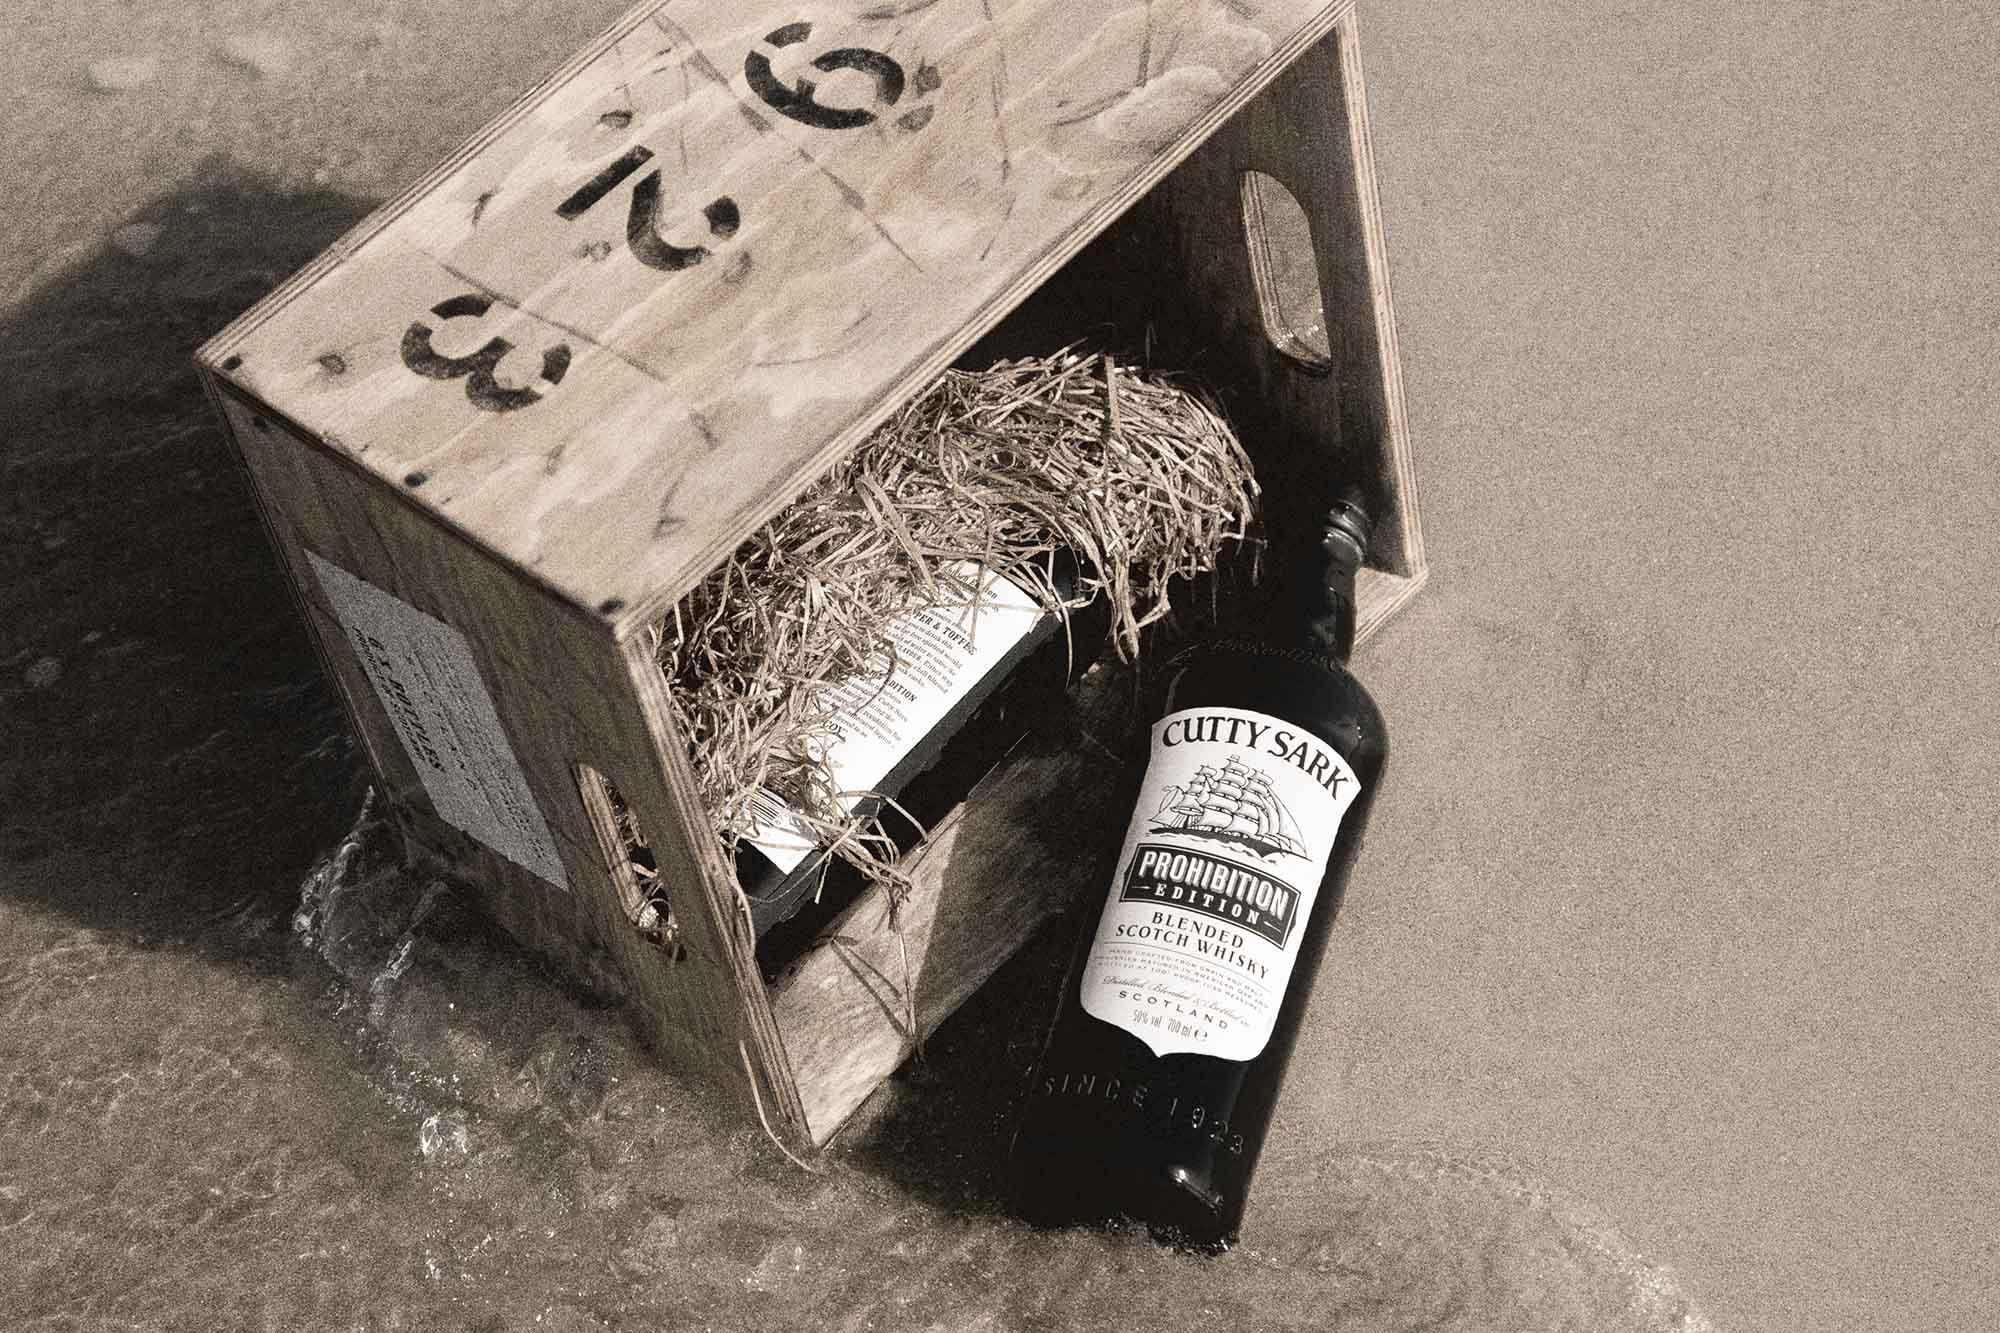 Mountain_Cutty Sark_Prohibition_004.jpg